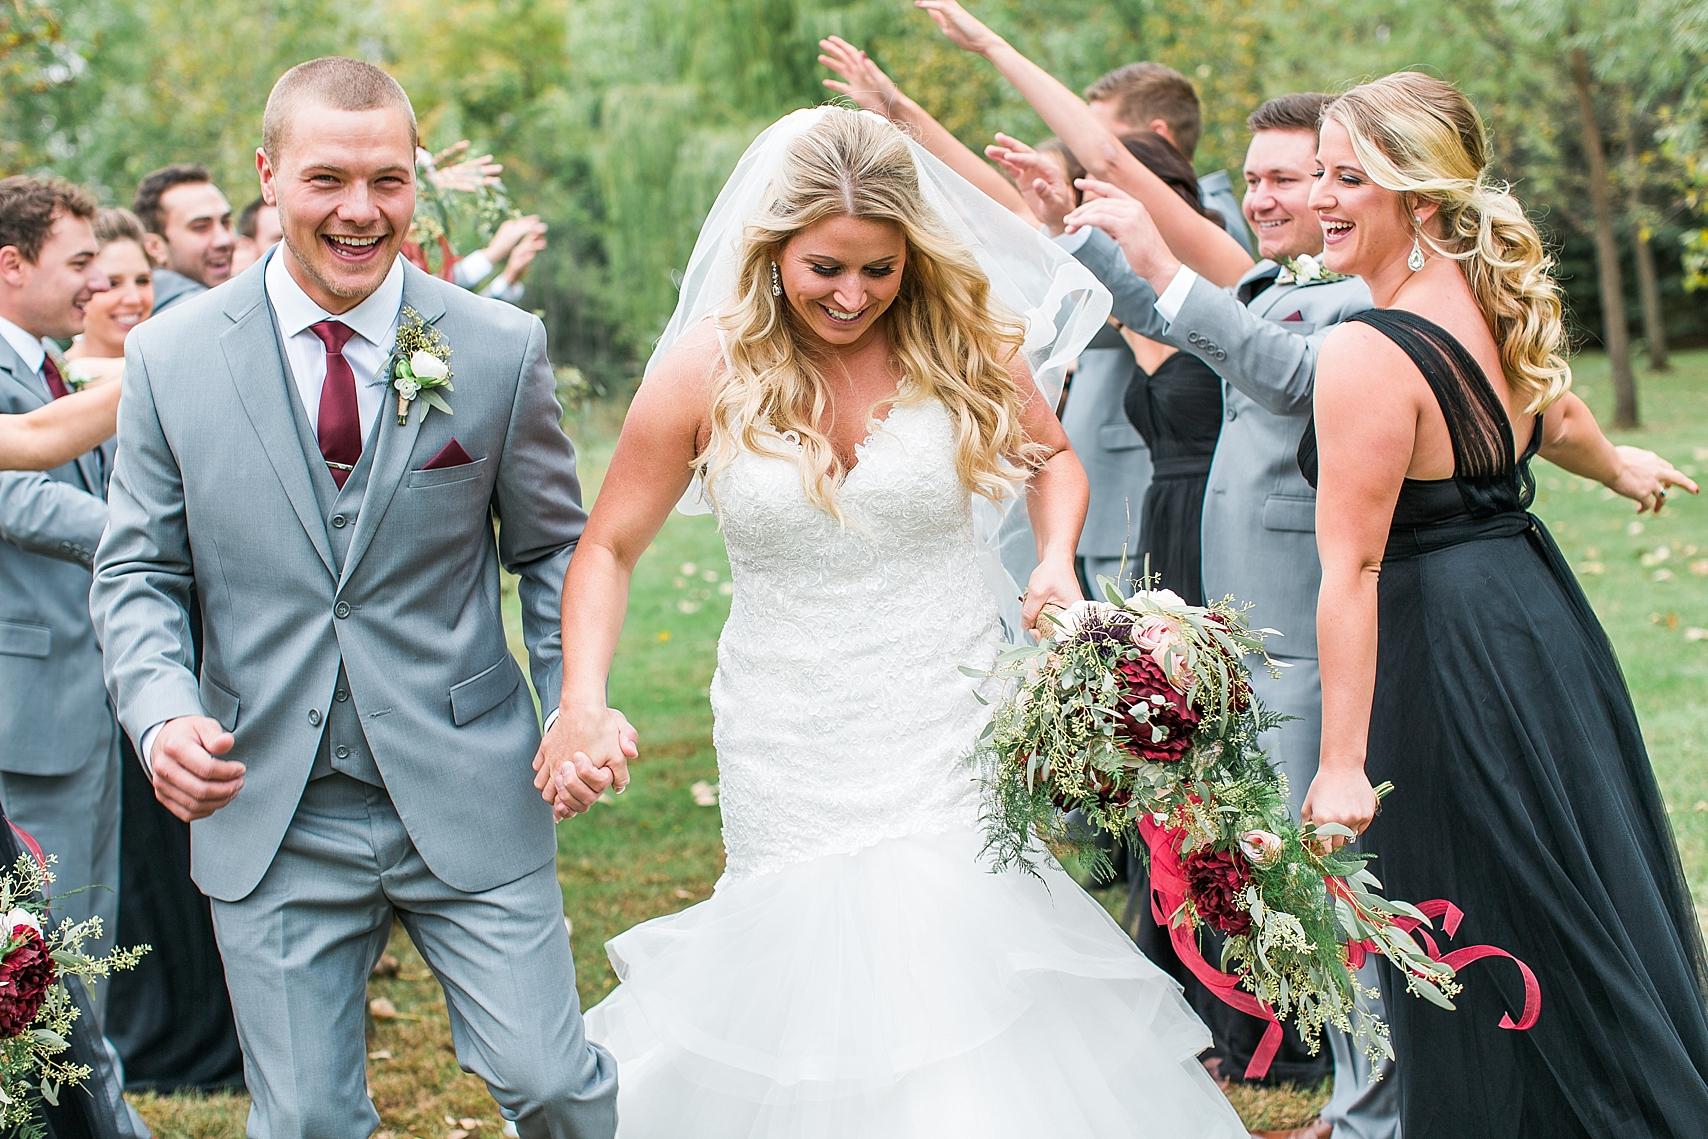 Minnesota Minneapolis Wedding Photographer Best Of 2018 Weddings Mallory Kiesow Photography_0200.jpg